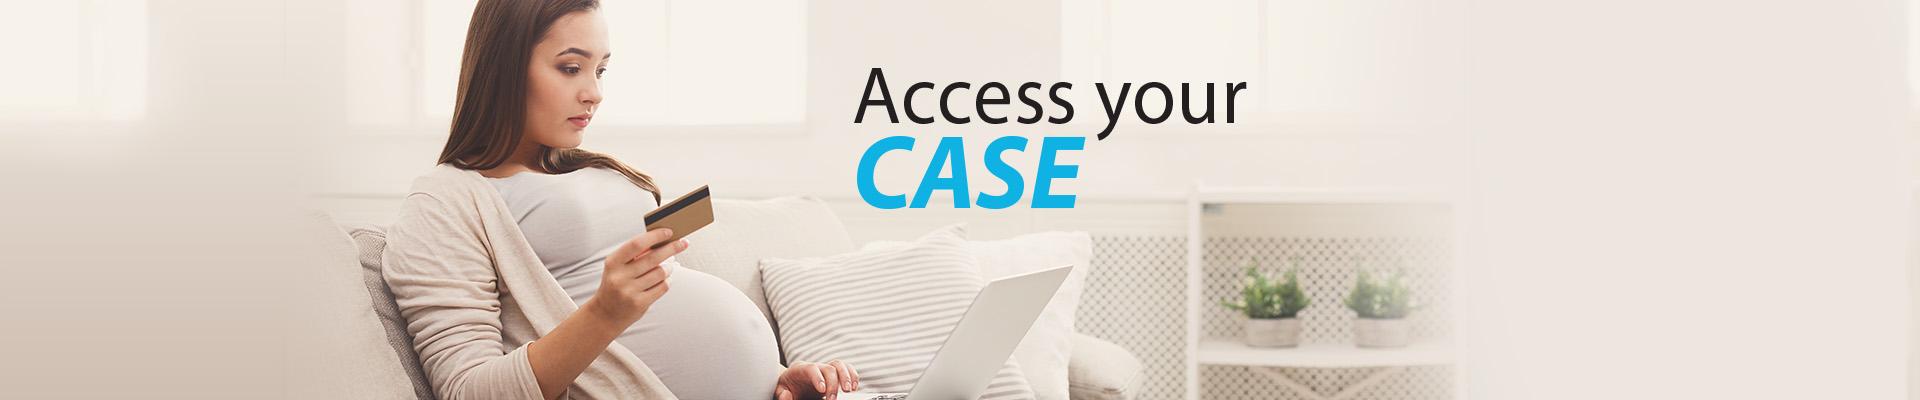 Access Case